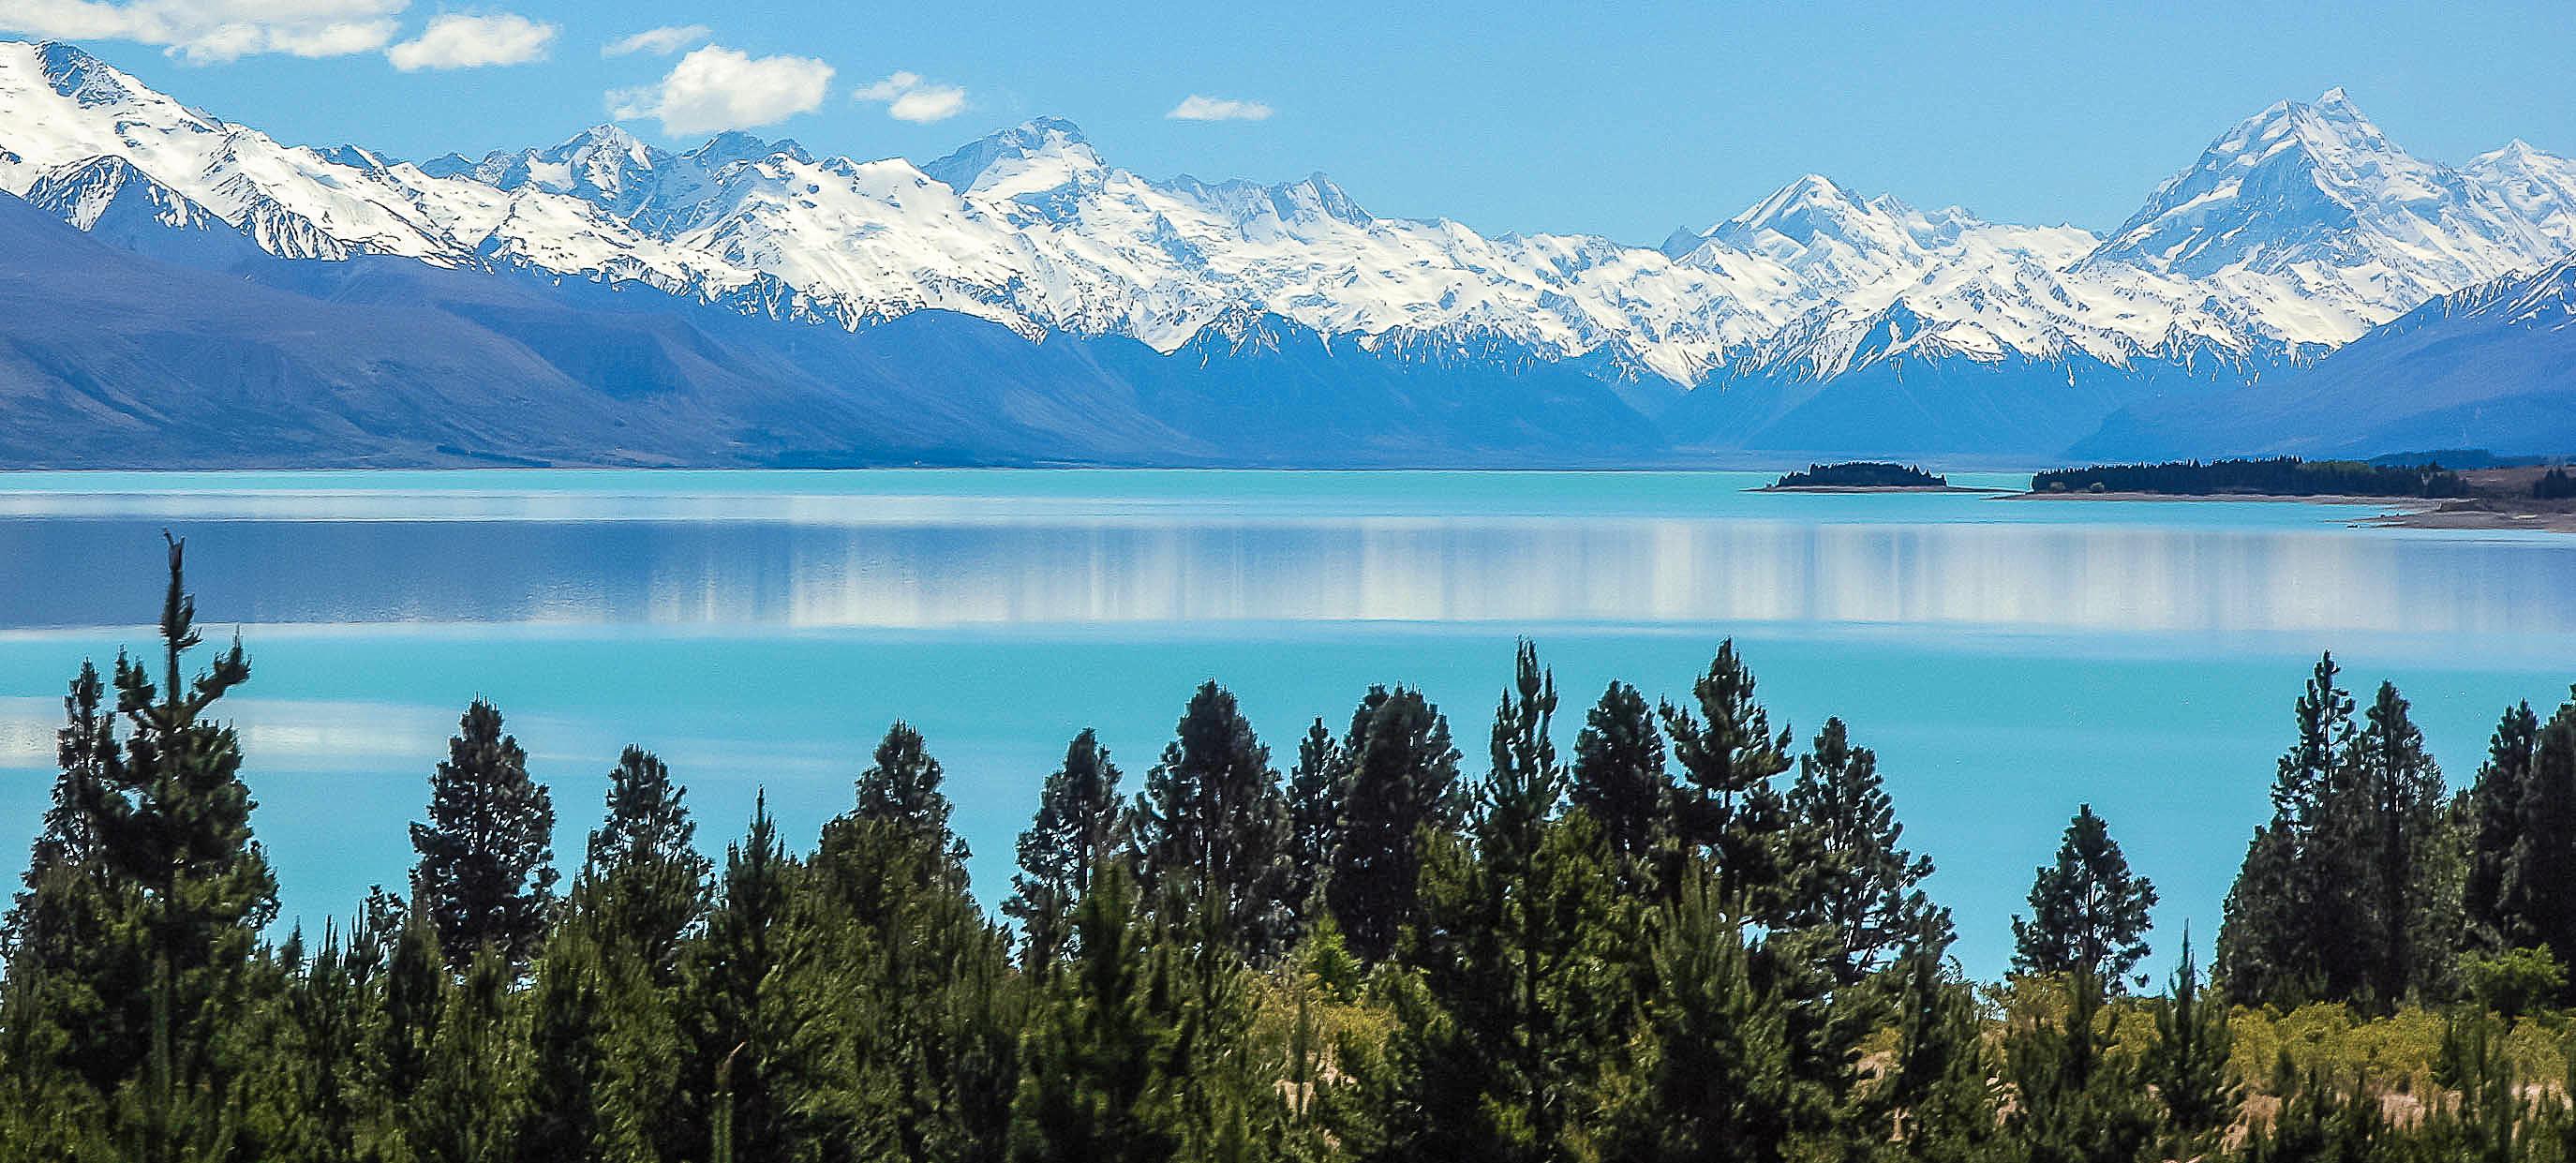 Apple Wallpaper Iphone 7 1000 Beautiful Mountain Range Photos 183 Pexels 183 Free